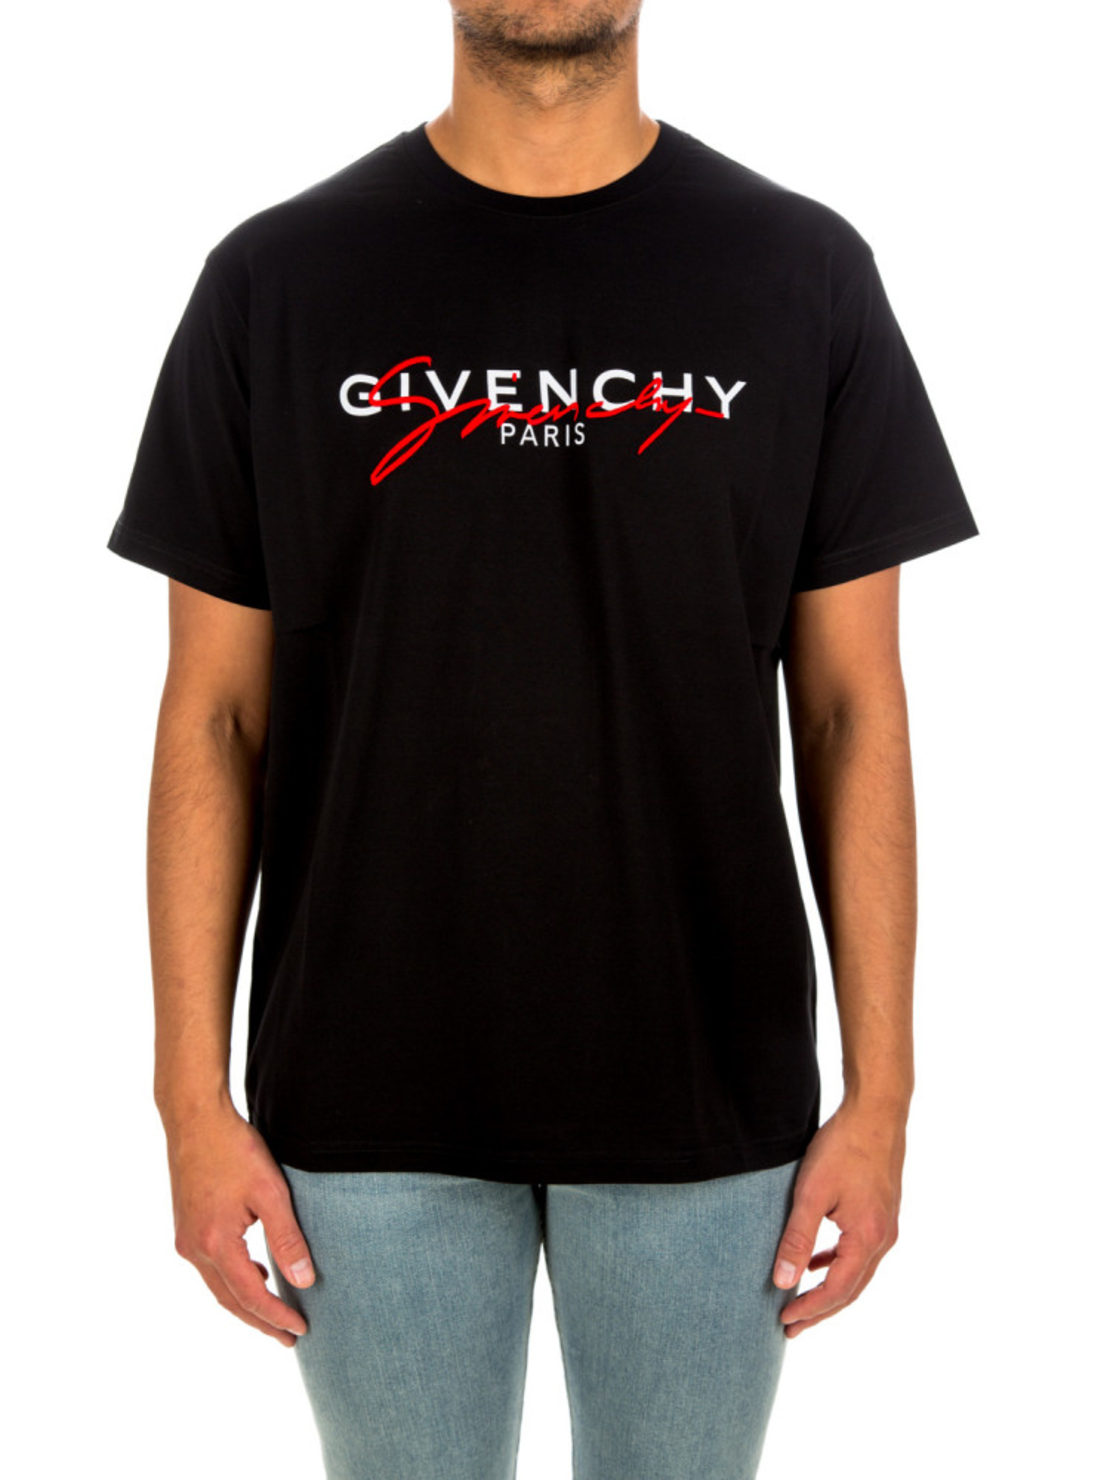 GIVENCHY- Signature Logo Tee